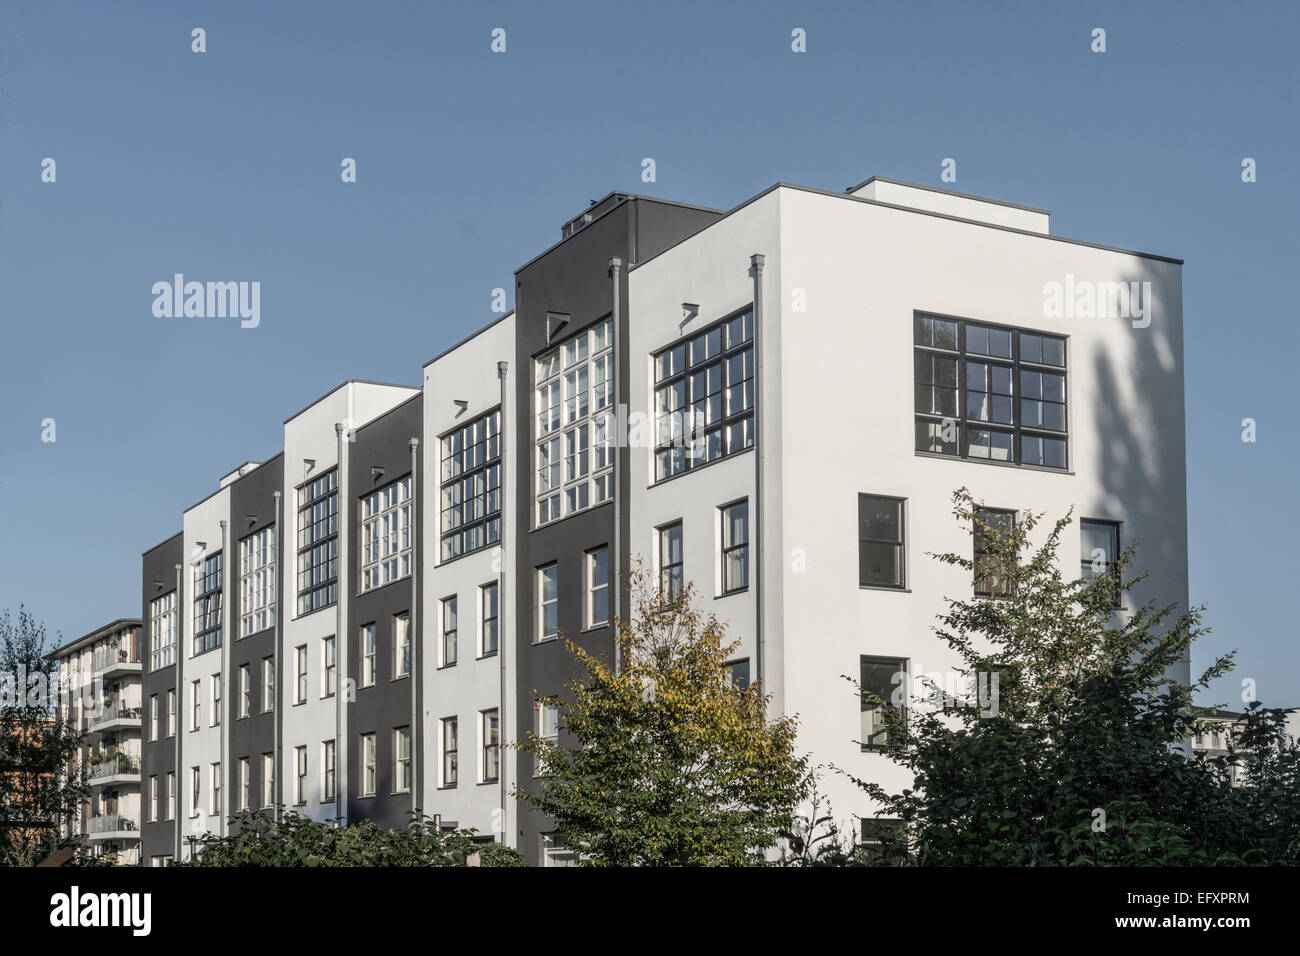 Modern Architecture Berlin modern architecture, real estate, town house, rummelsburger bucht